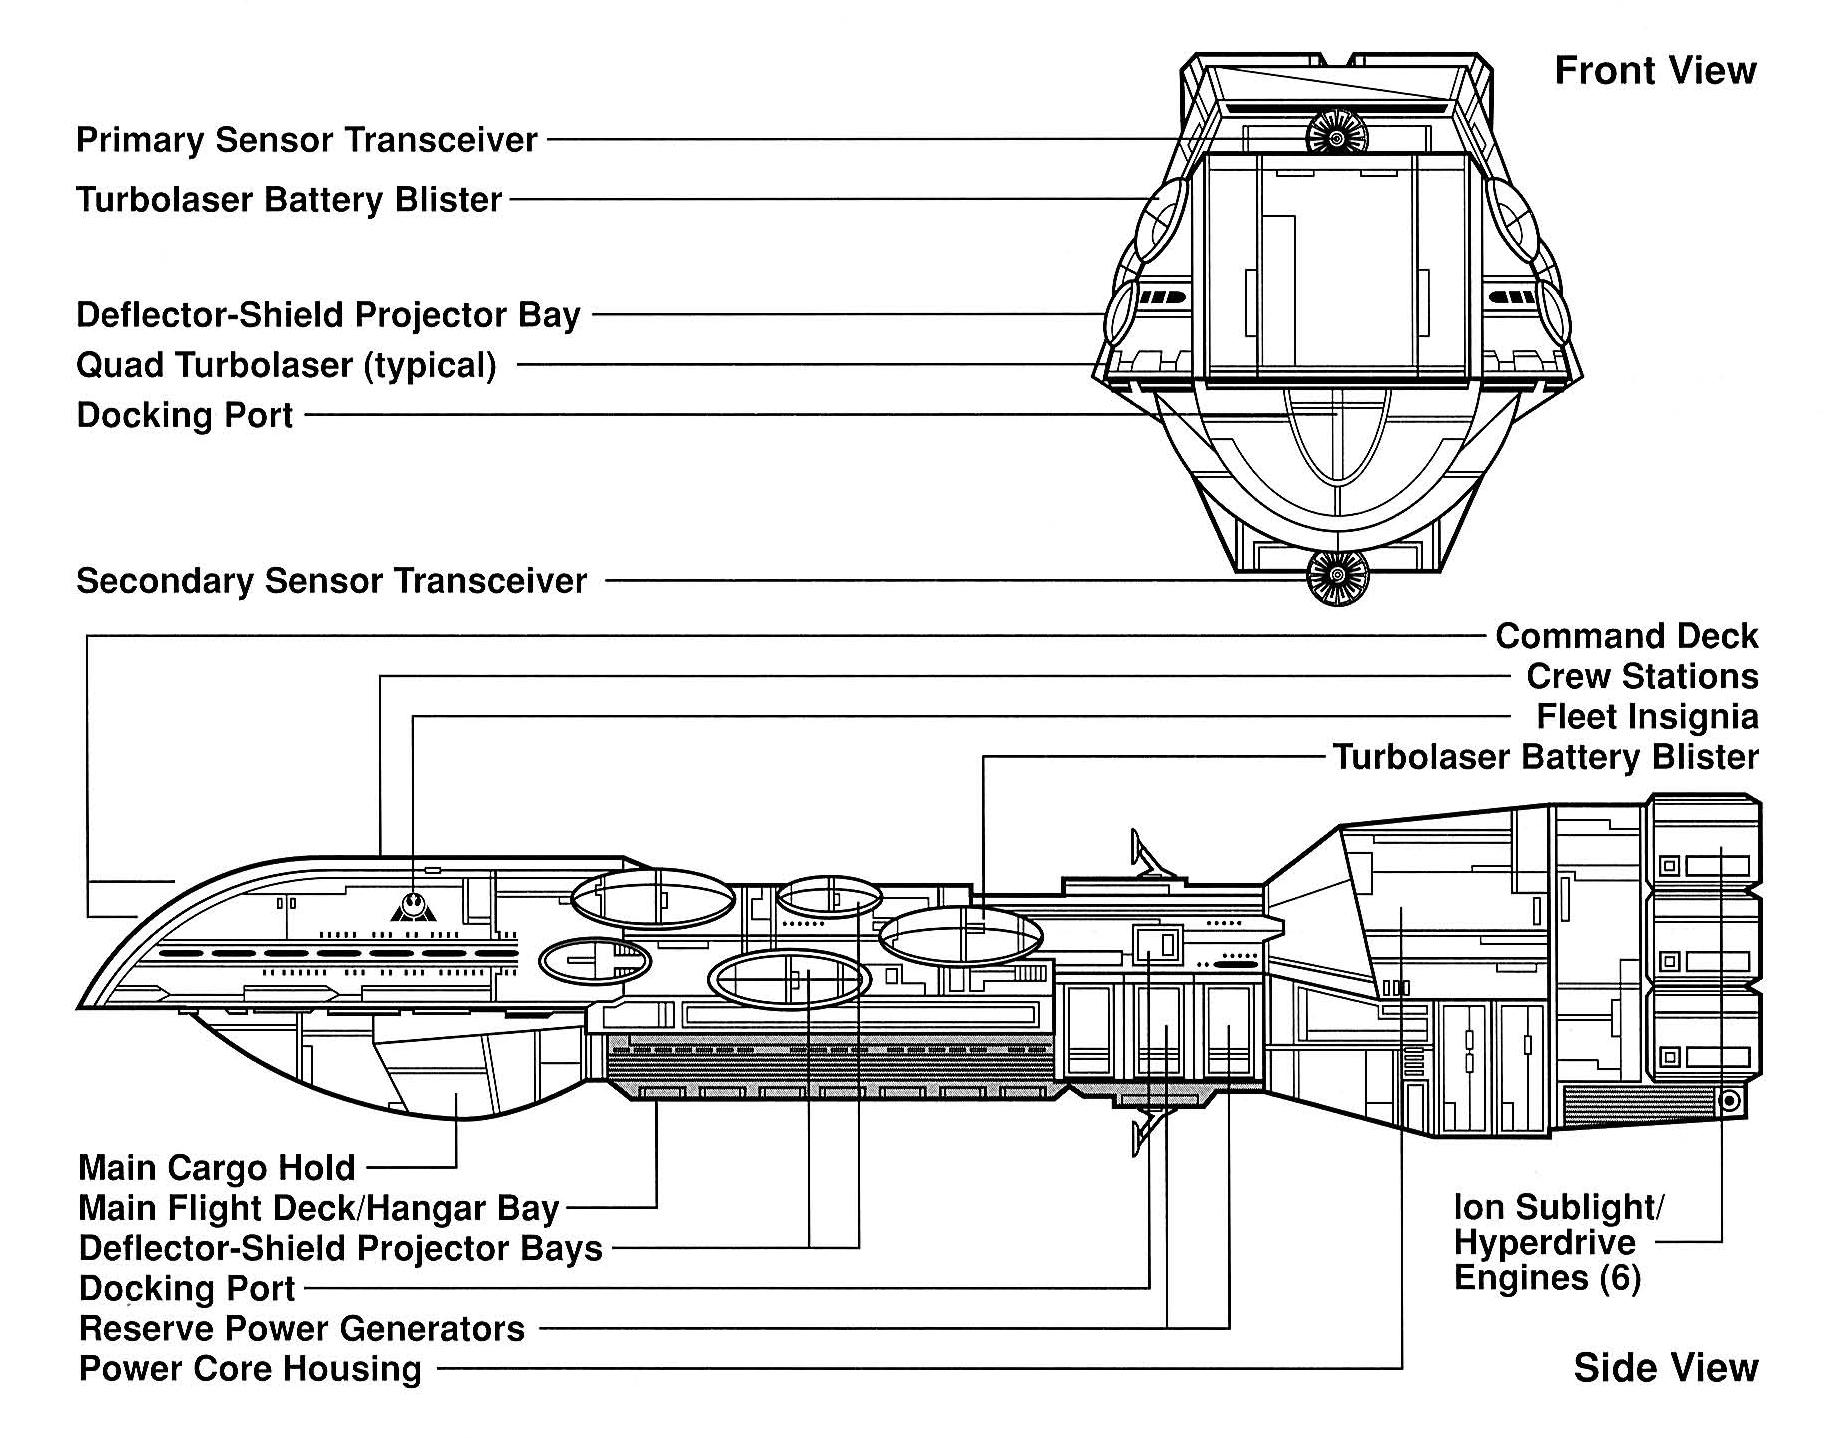 Dreadnaught class heavy cruiser wookieepedia fandom powered by wikia malvernweather Choice Image